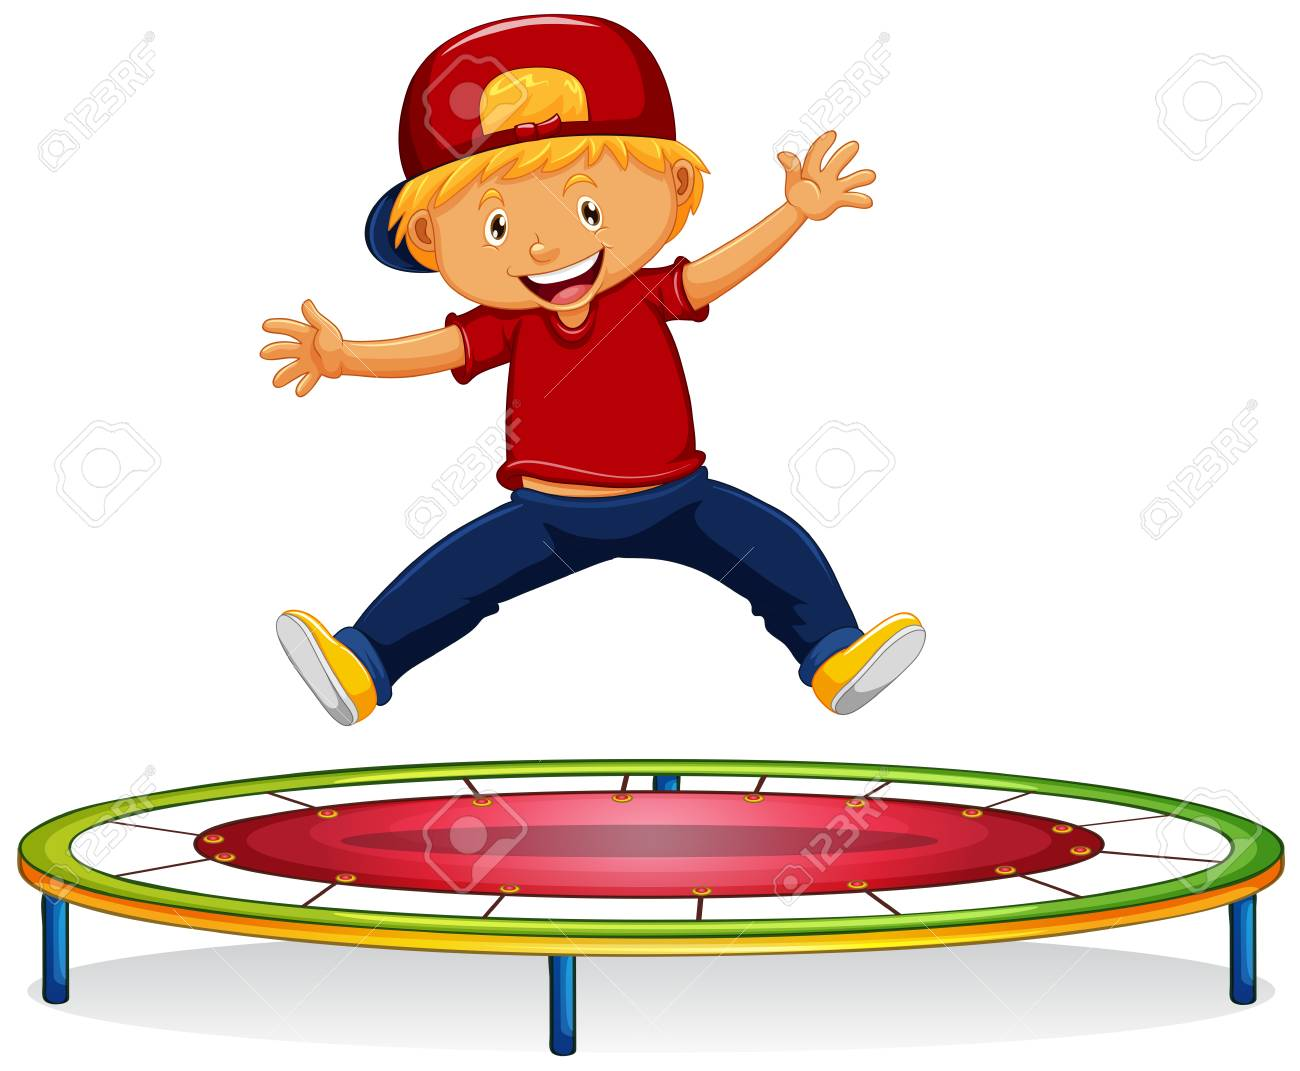 Happy boy jumping on trampoline illustration.